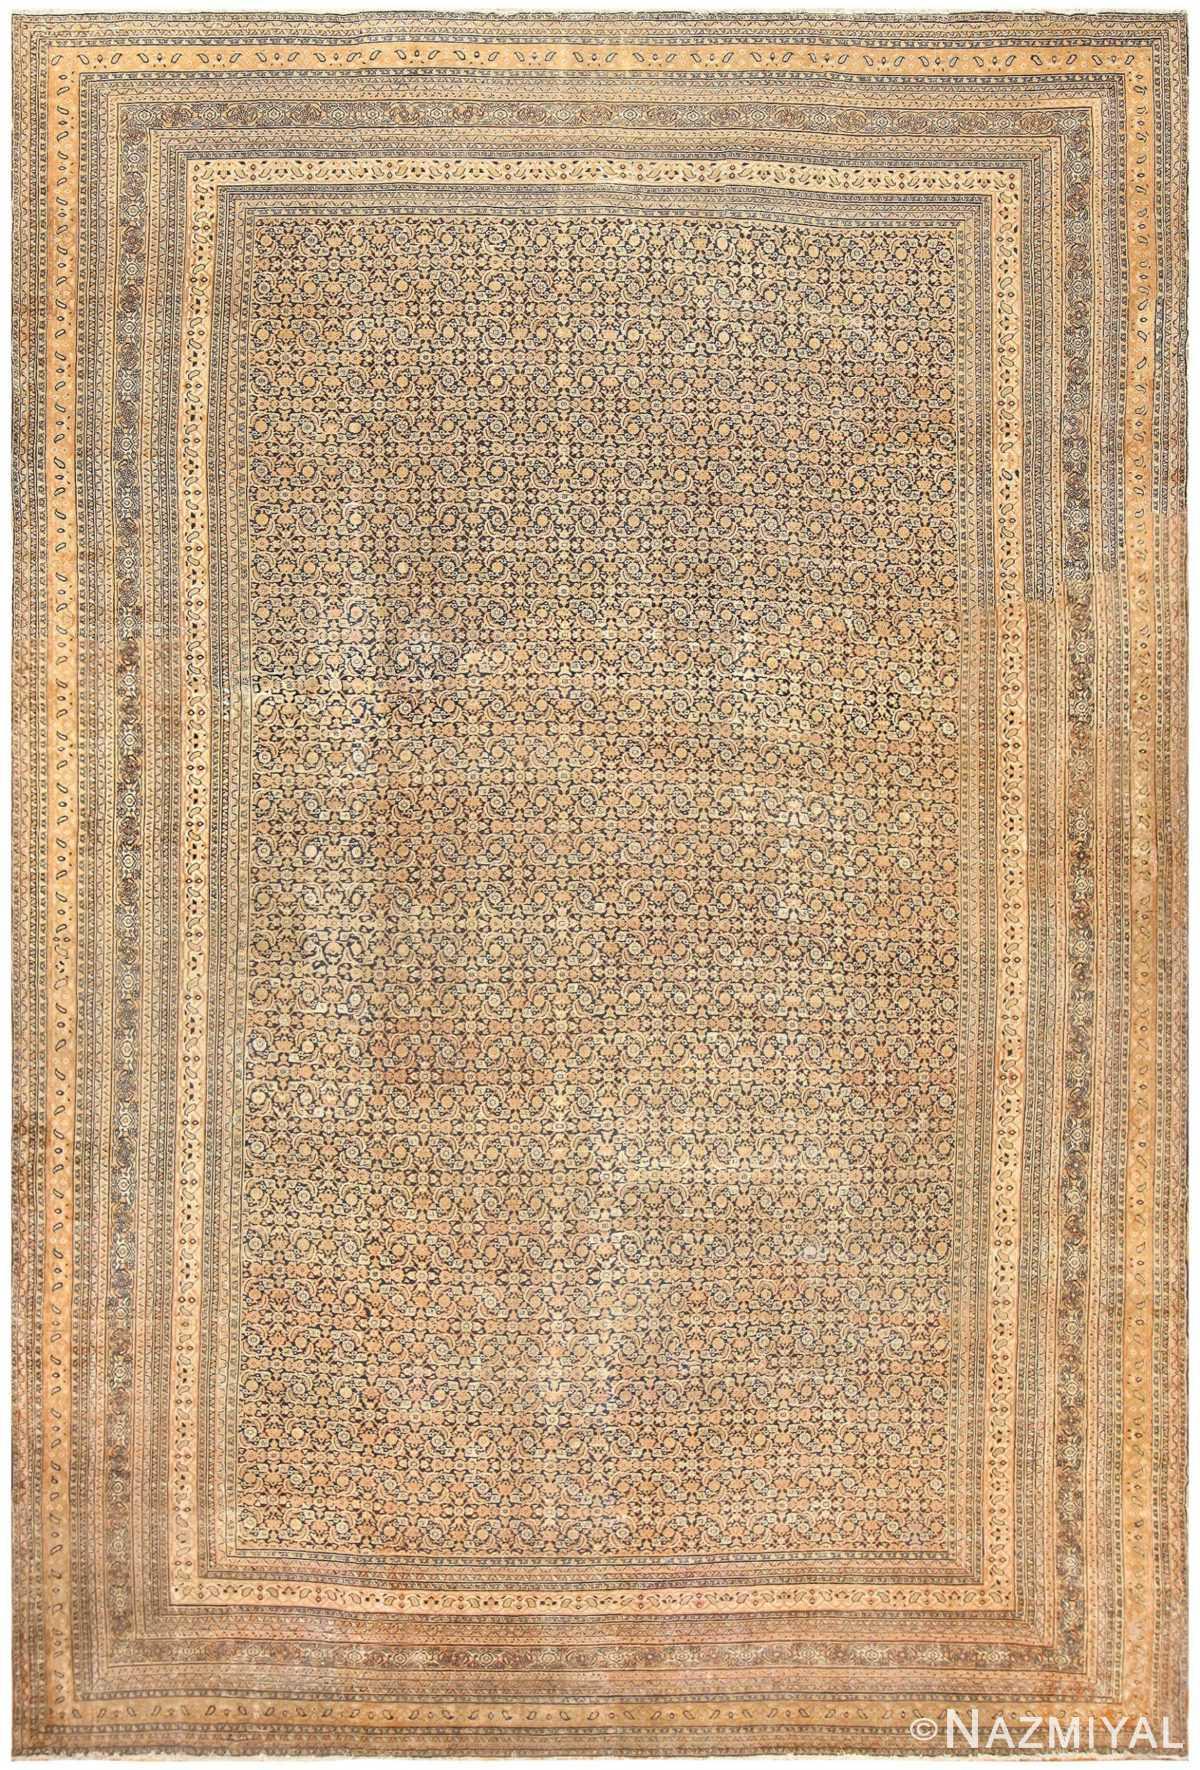 Oversized Antique Persian Khorassan Carpet 50215 Nazmiyal